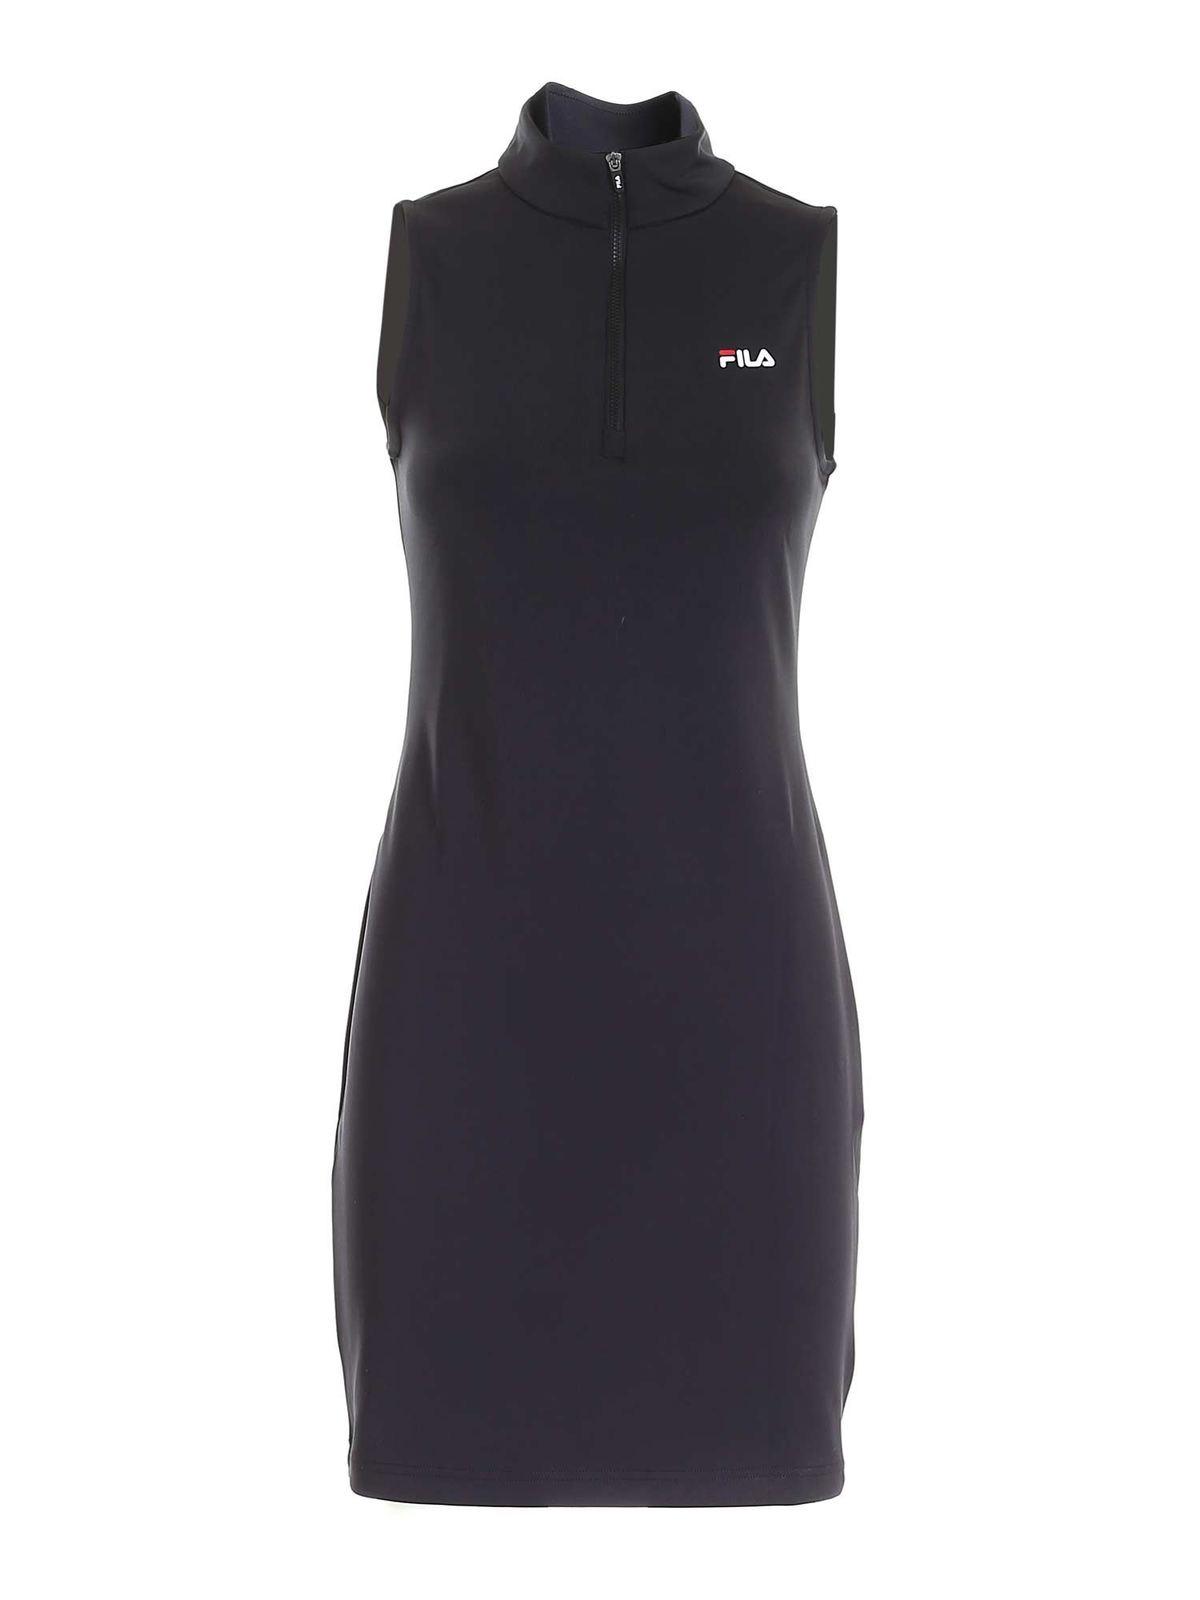 Fila CEARA SLEEVELESS DRESS IN BLACK